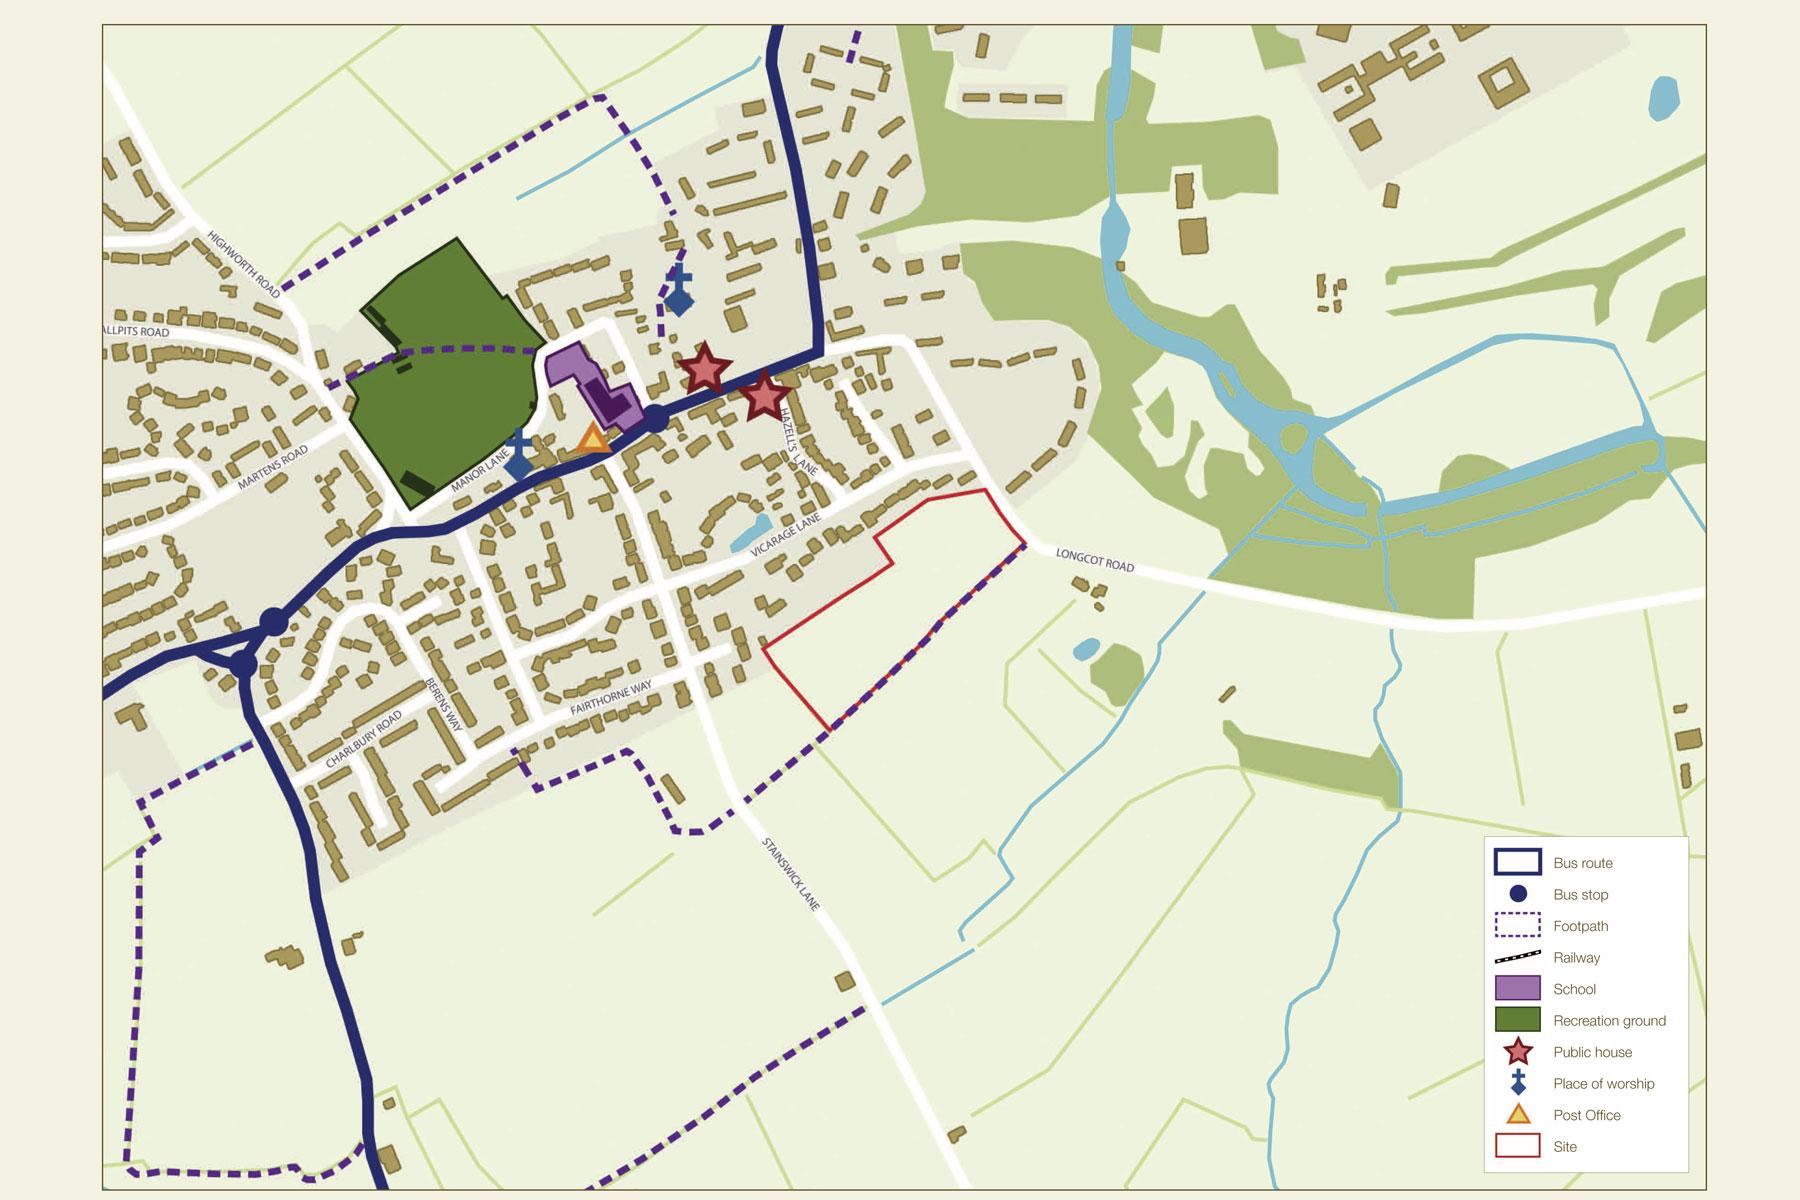 Shrivenham_Access_and_Movement_Local_Facilities